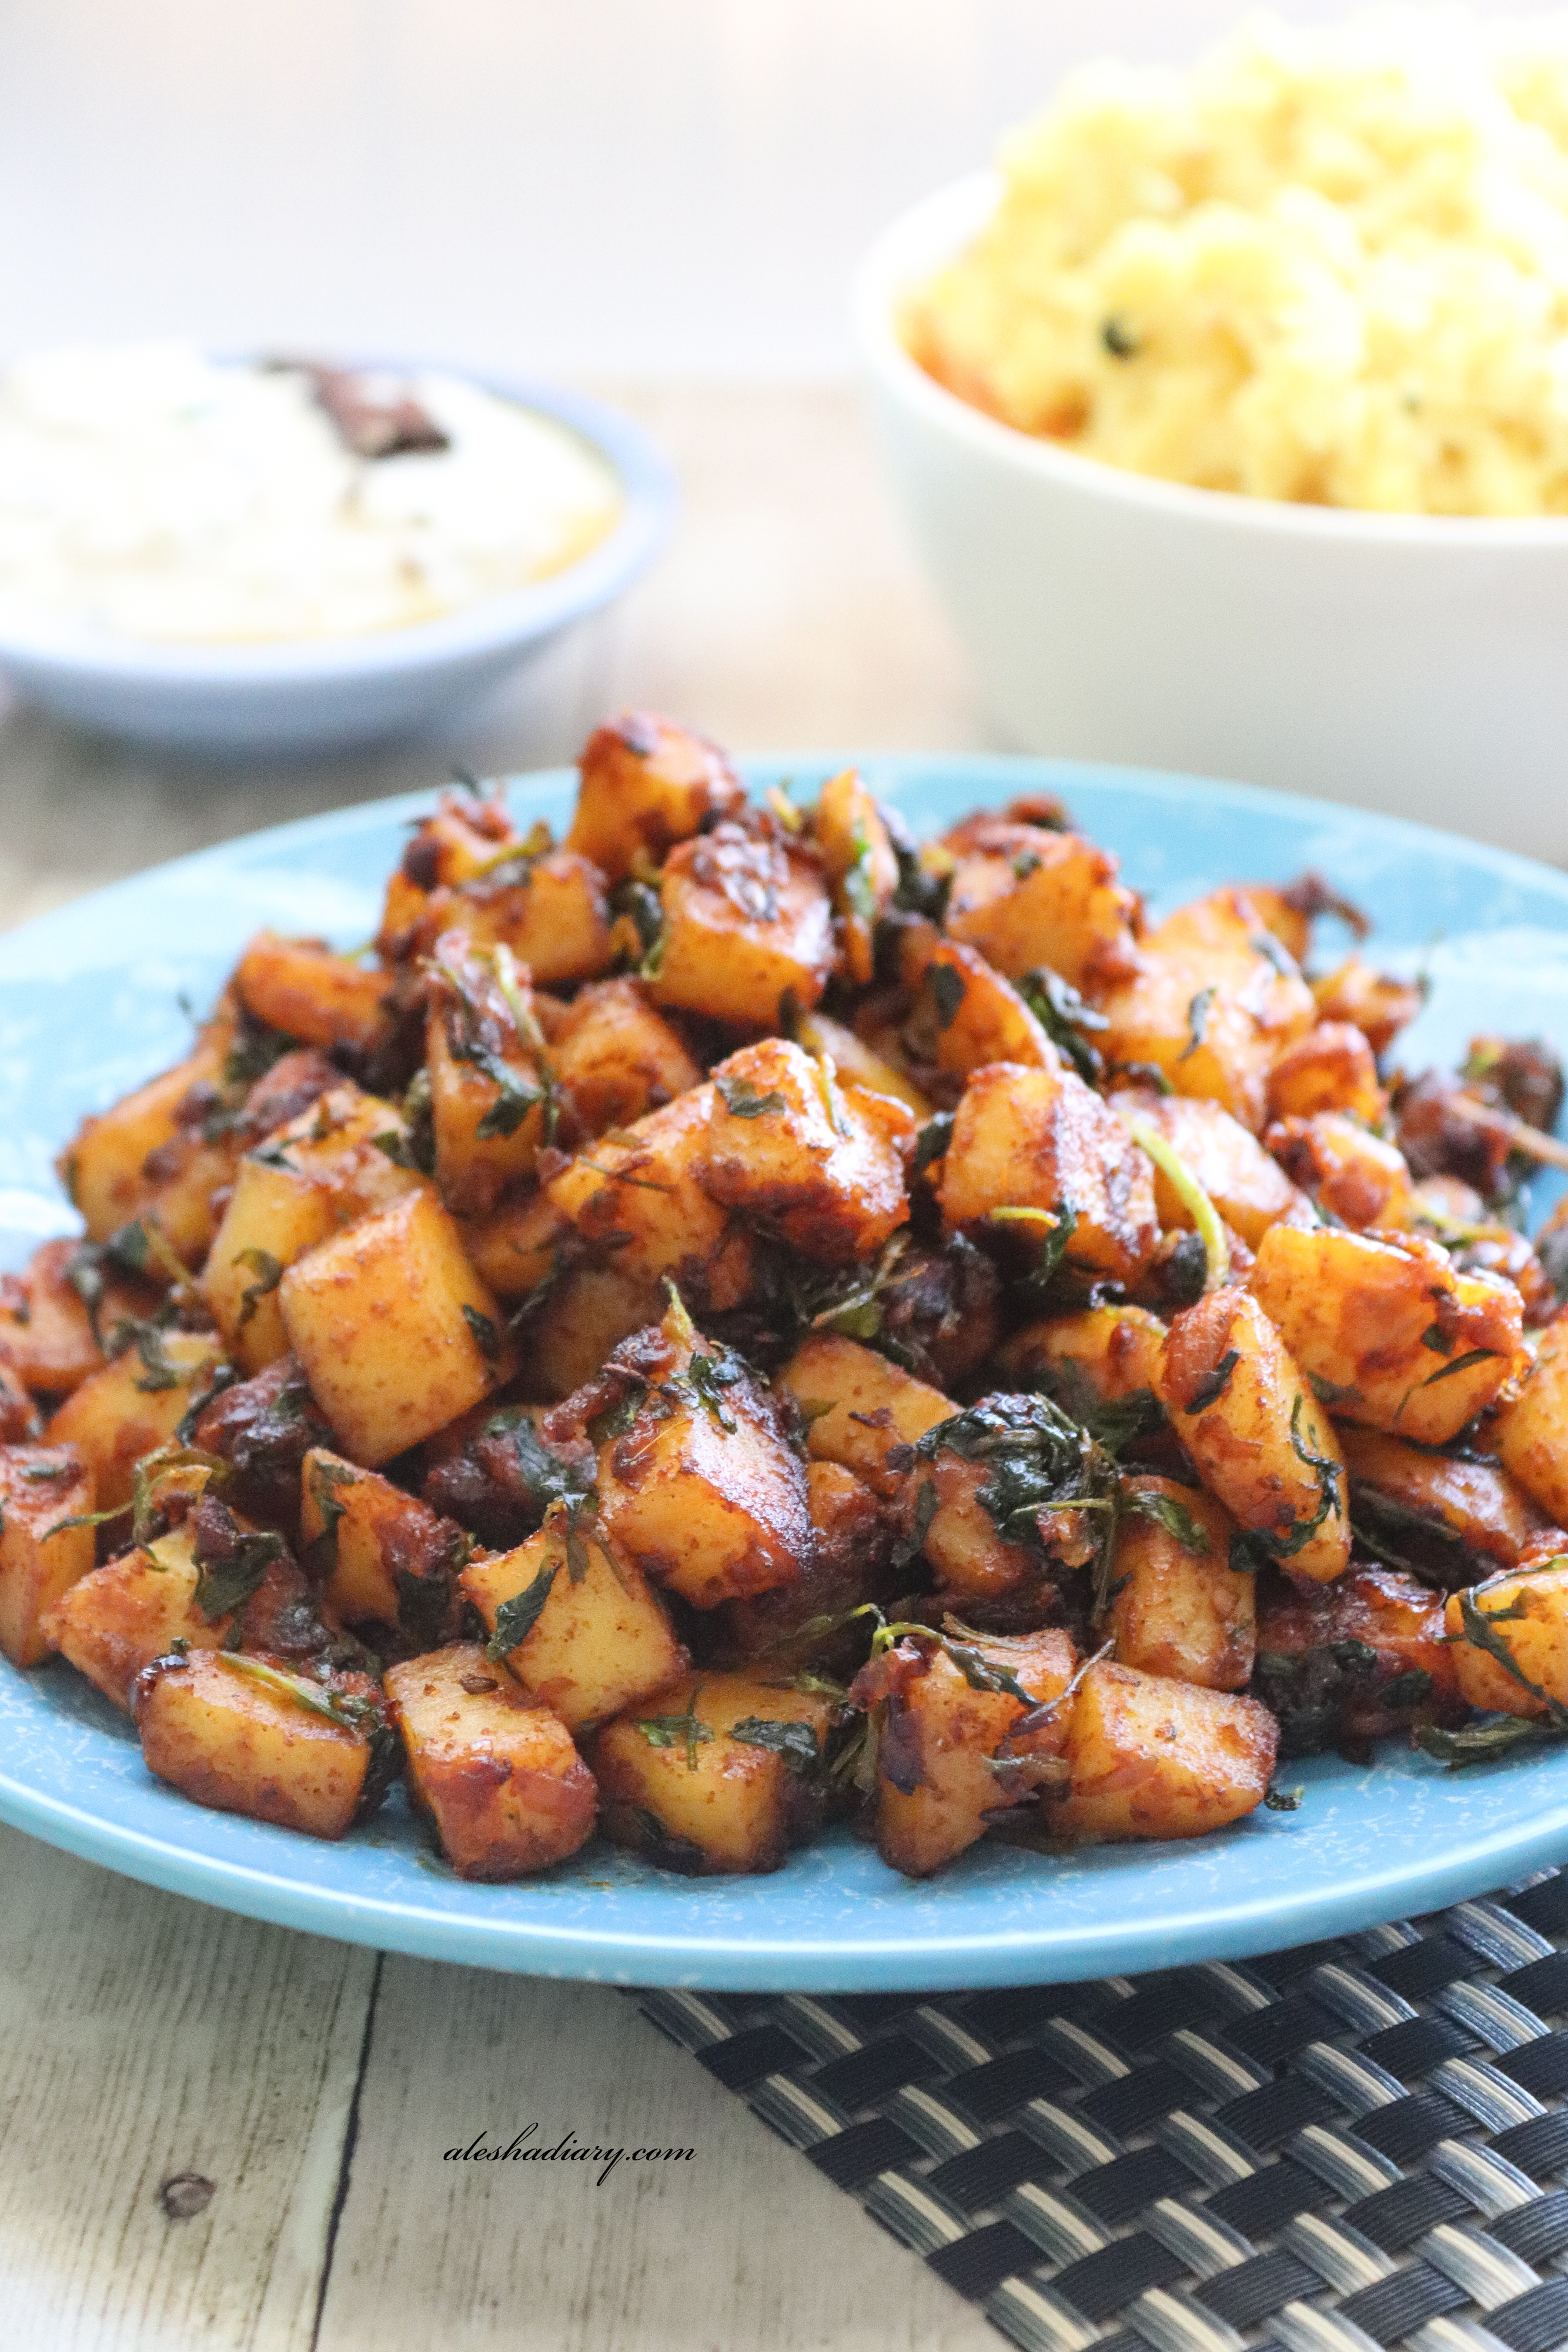 Aloo methi fry – Potato with fenugreek leaves